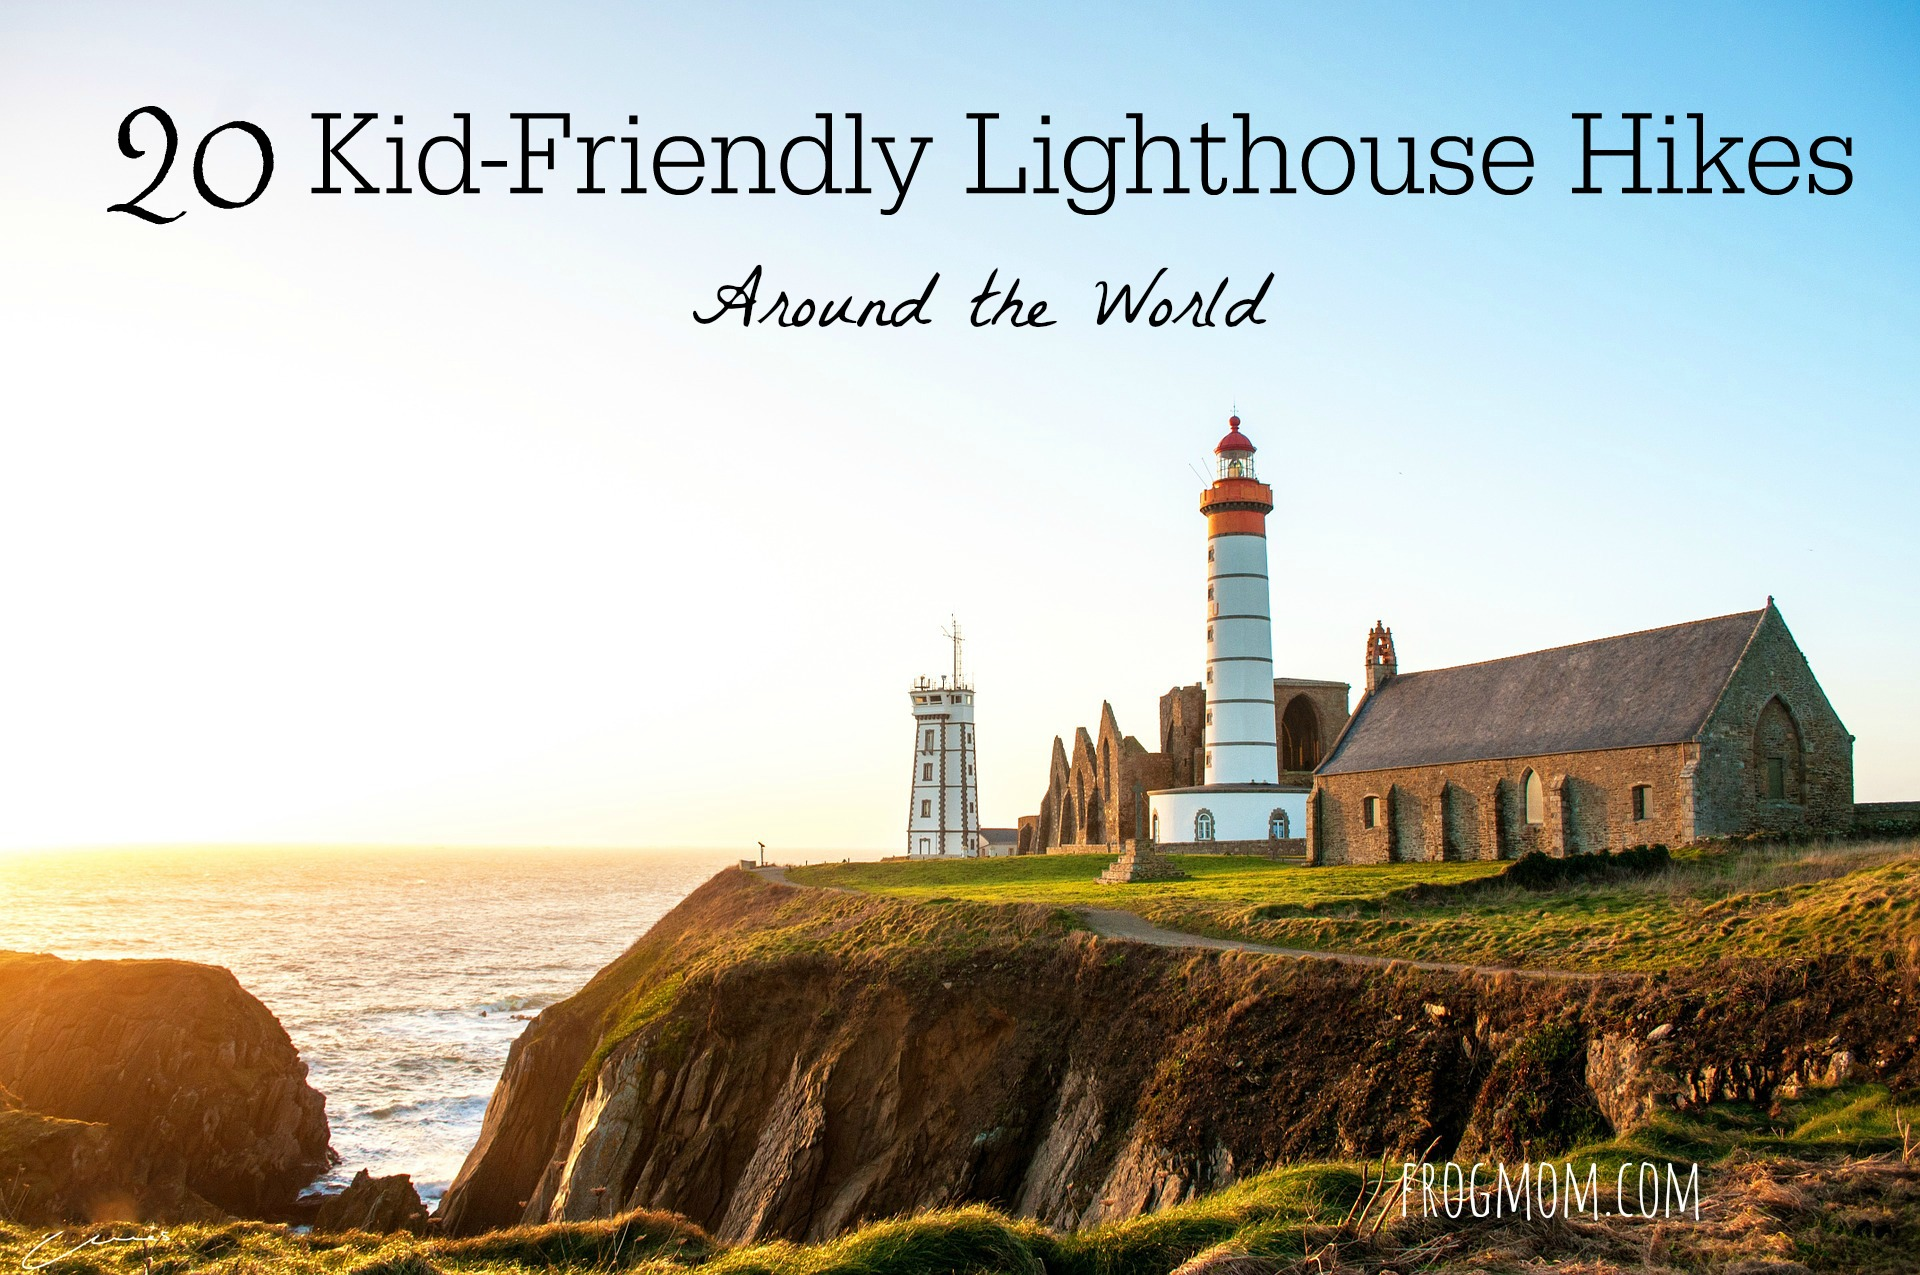 Lighthouse Hikes Around the World